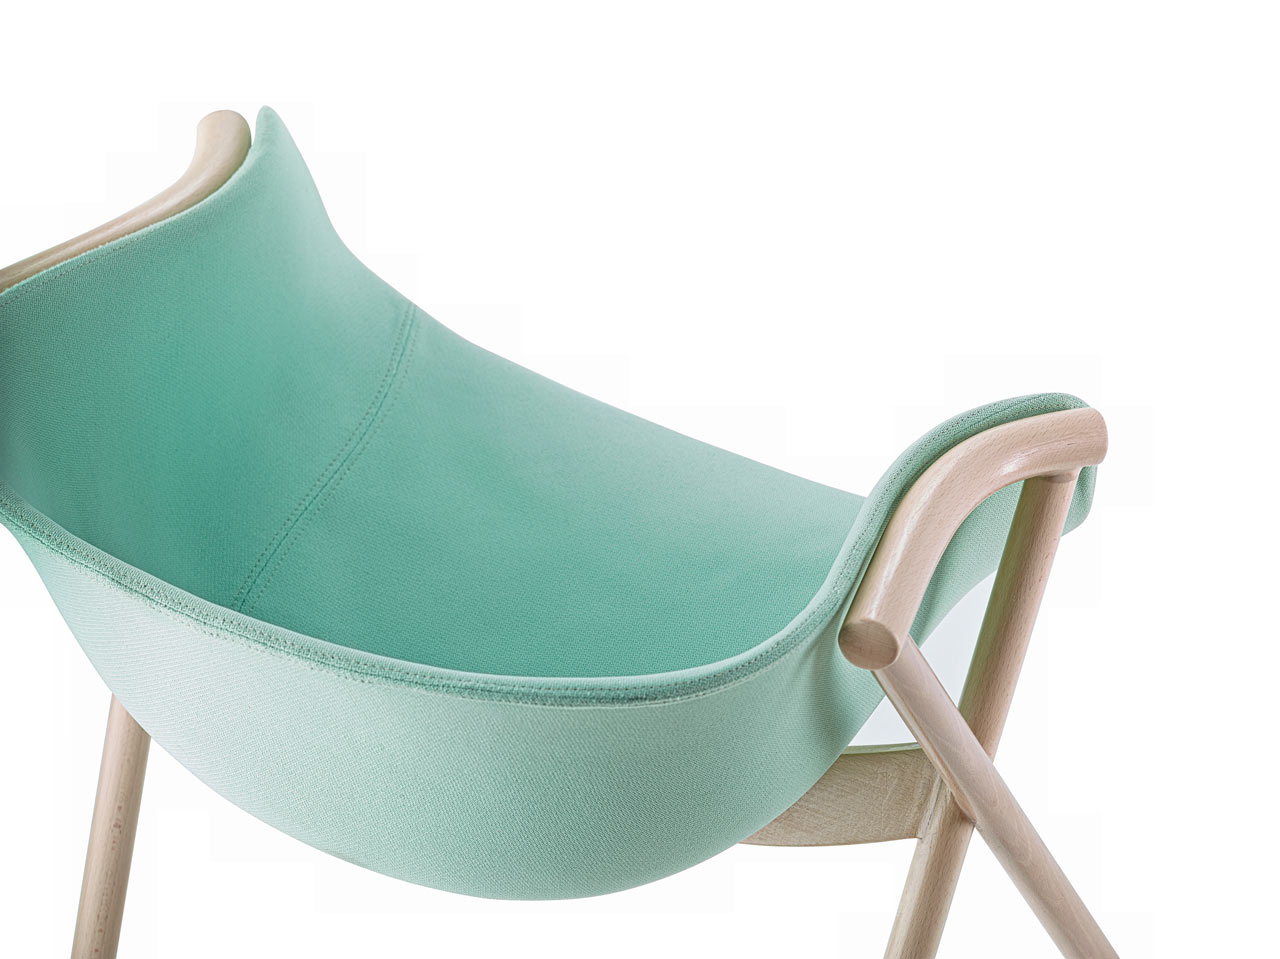 Bai-Chair-Ondarreta-Ander-Lizaso-1